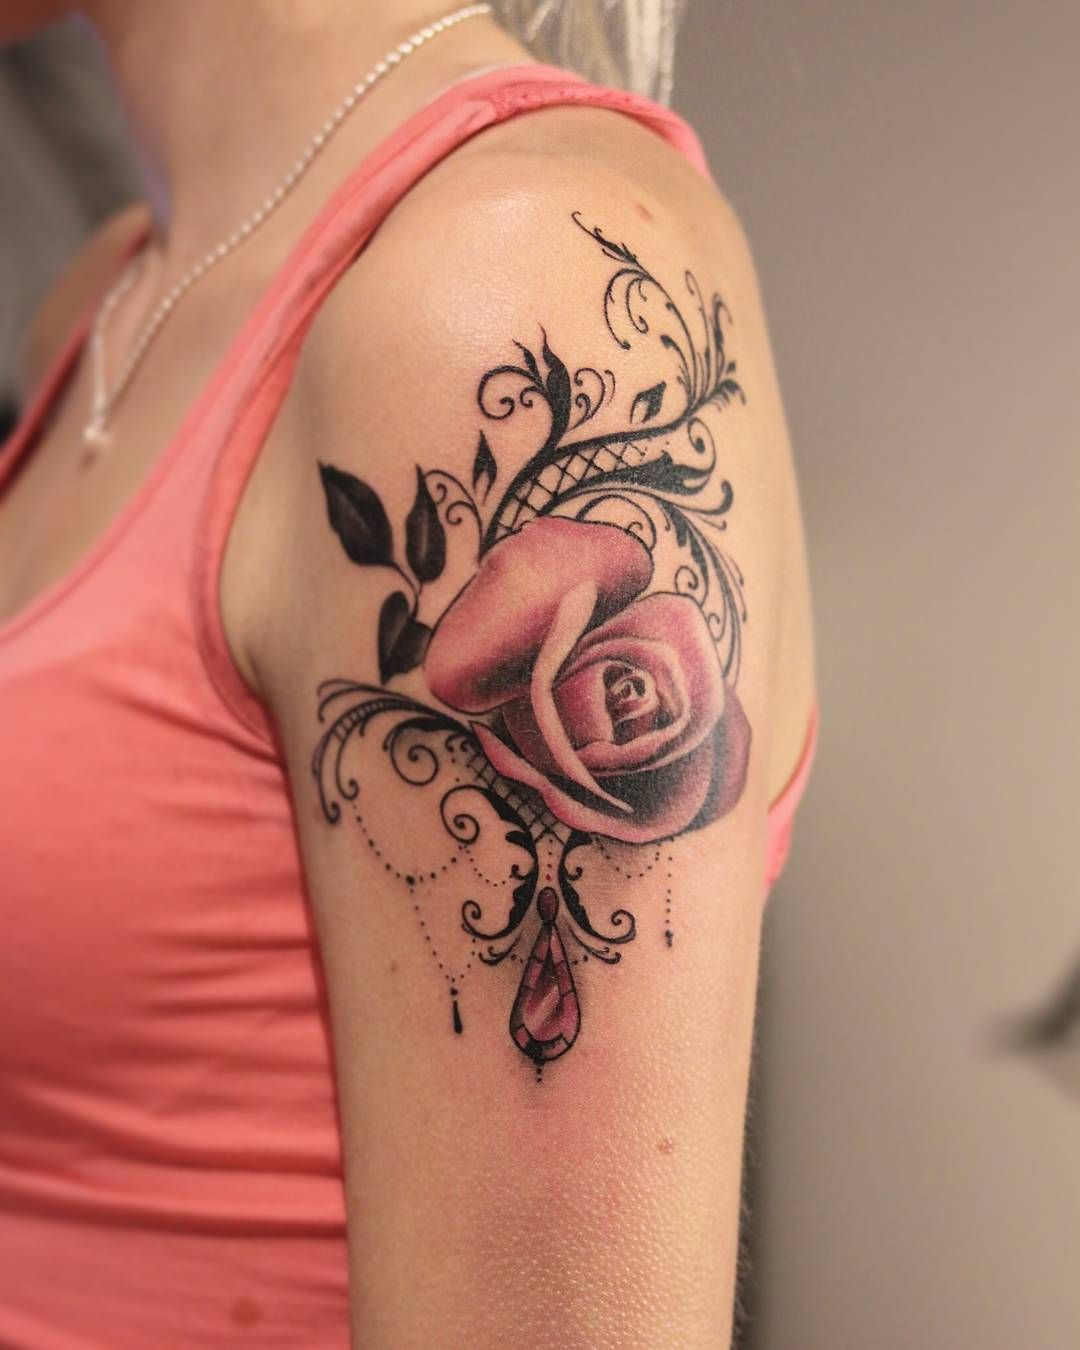 Lovely one #rose #rosetattoo #lace #lacetattoo #diamond #diamondtattoo #girlytattoo #tattoo #colourtattoo #tattooed #turkutattoo #soulskintattoo